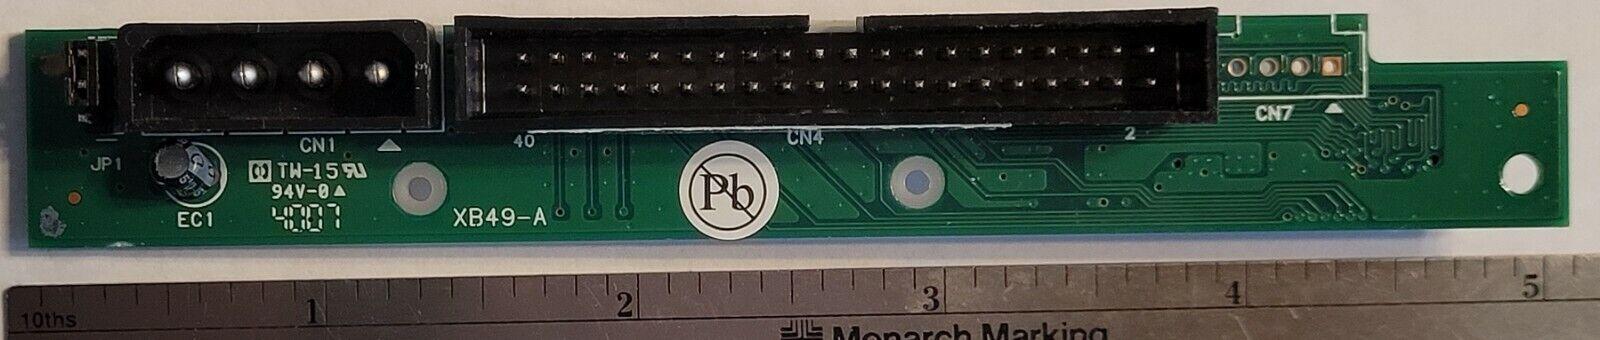 IBM SurePos ATAPI to IDE Adapter Board 47P9157 TW-15 / XB49-A Converter